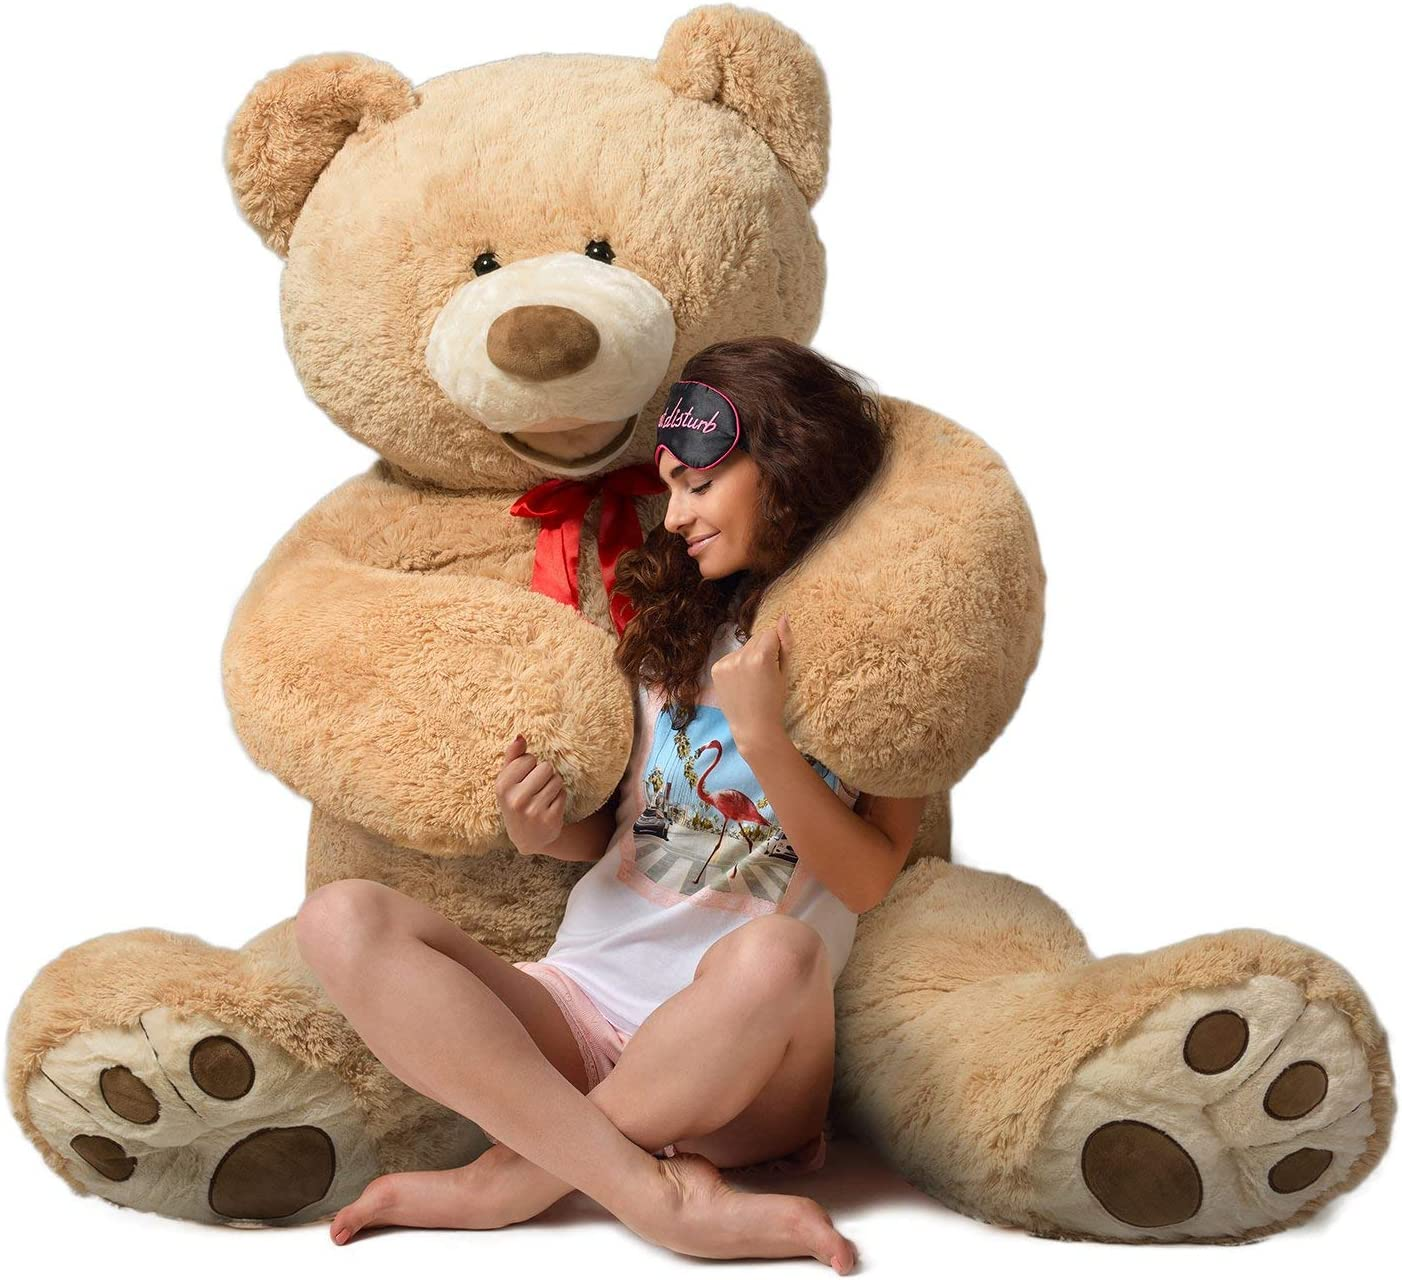 HollyHOME Teddy Bear Stuffed Animal Giant Bears Plush Light Brown 60 Inches